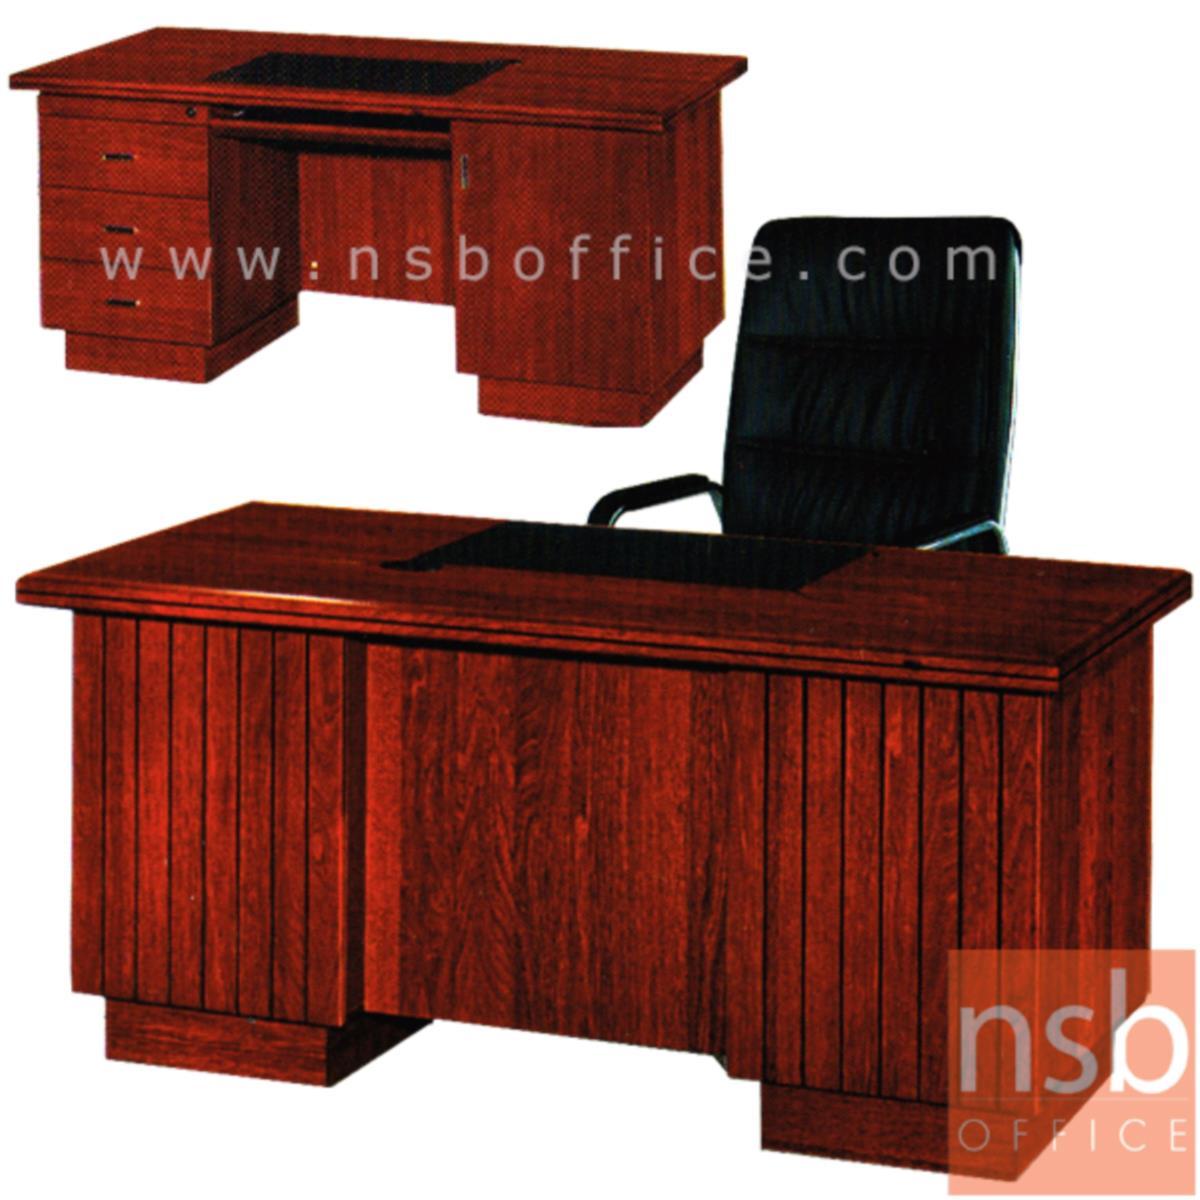 A06A115:โต๊ะผู้บริหารทรงตรง 3 ลิ้นชัก รุ่น Liberty (ลิเบอร์ตี้) ขนาด 160W cm. พร้อมรางคีย์บอร์ด